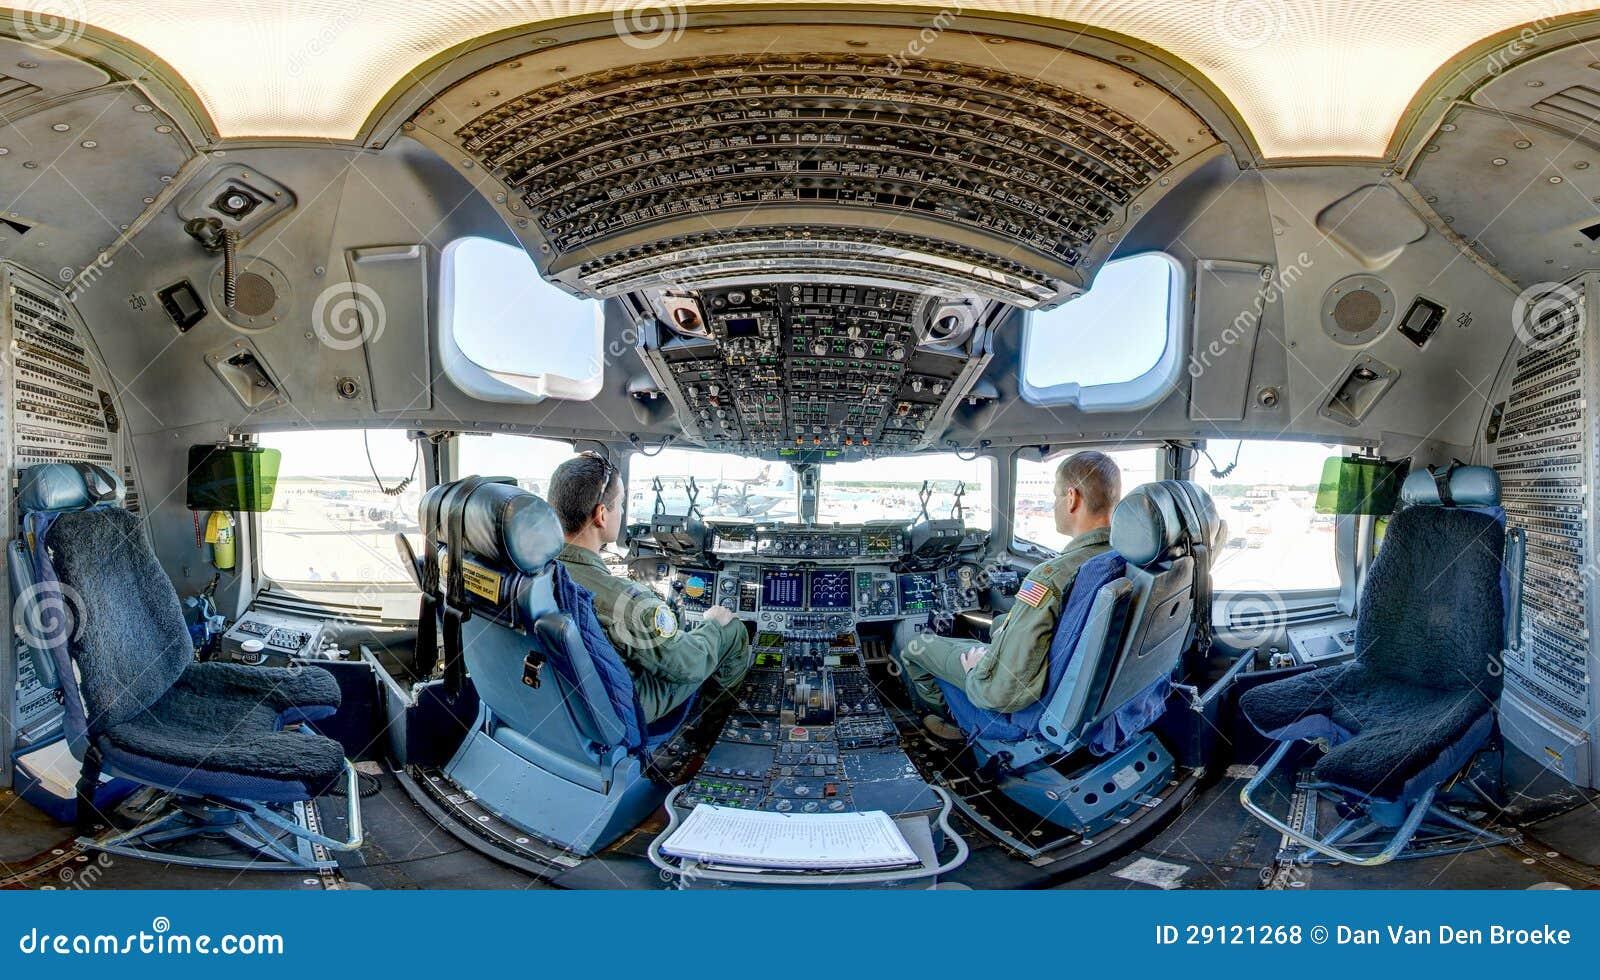 C-17 Globemaster III cockpit  C 17 Cockpit